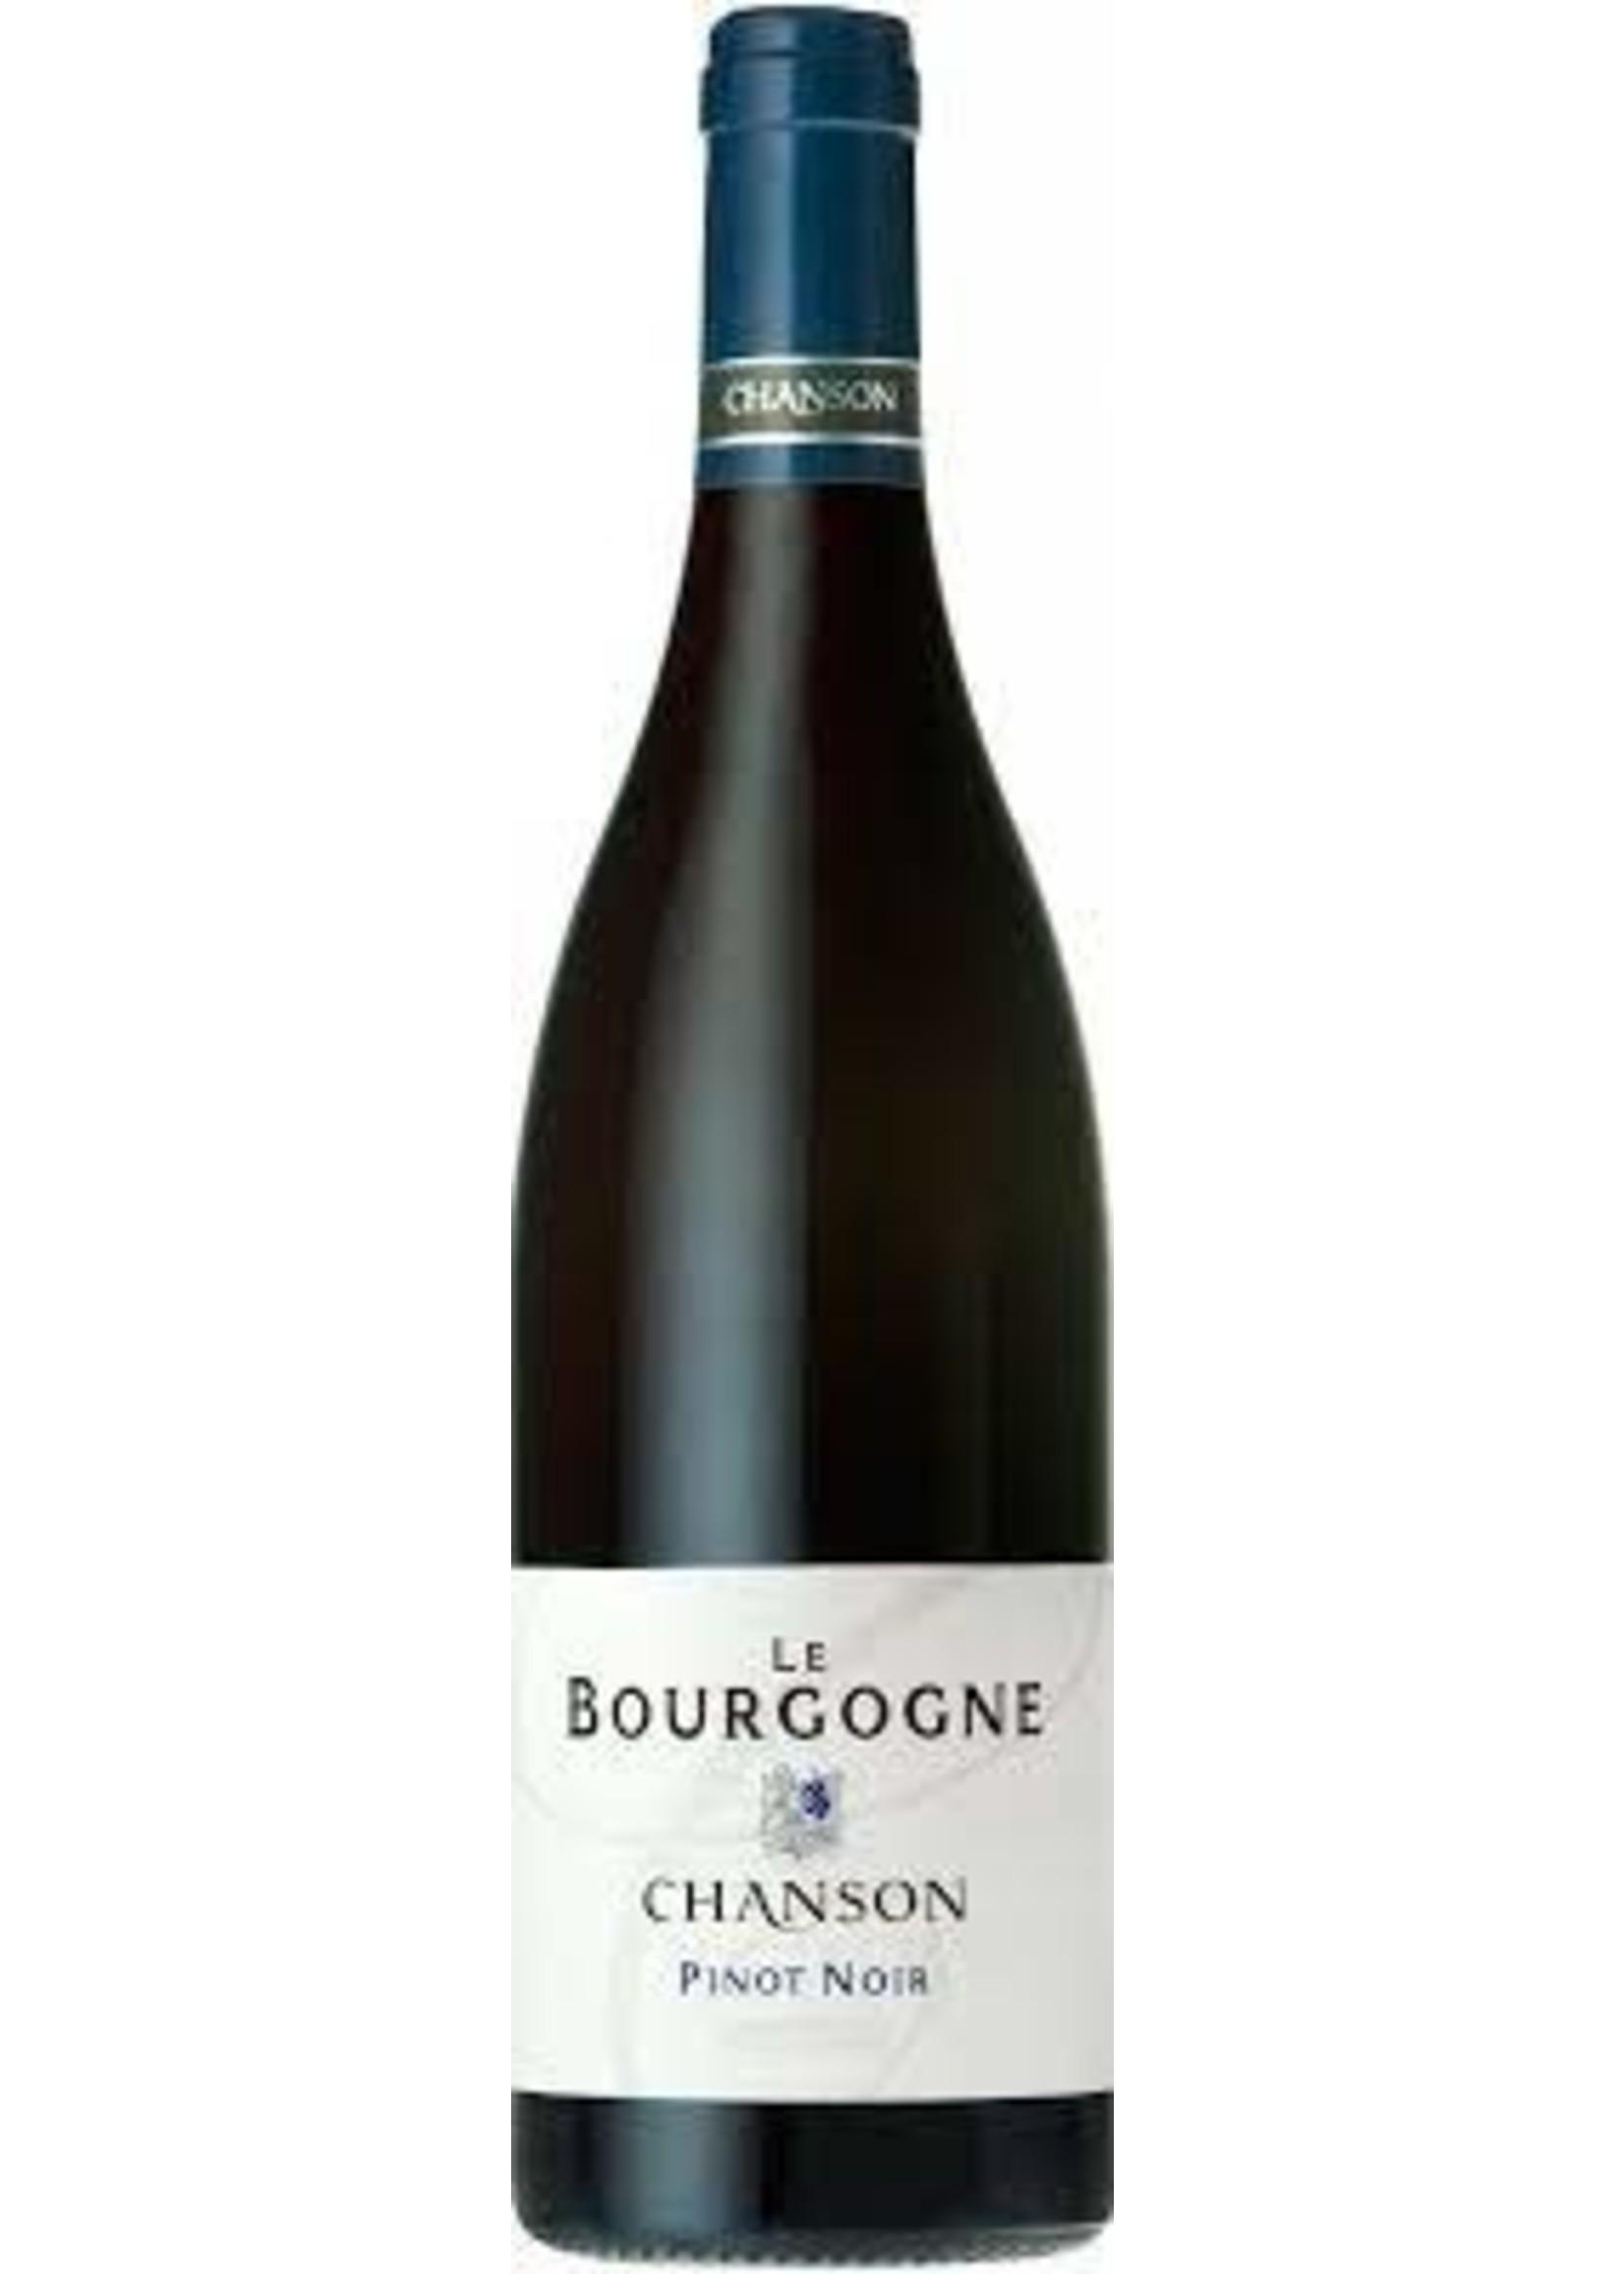 Chanson 2018 Le Bourgogne Pinot Noir 750ml